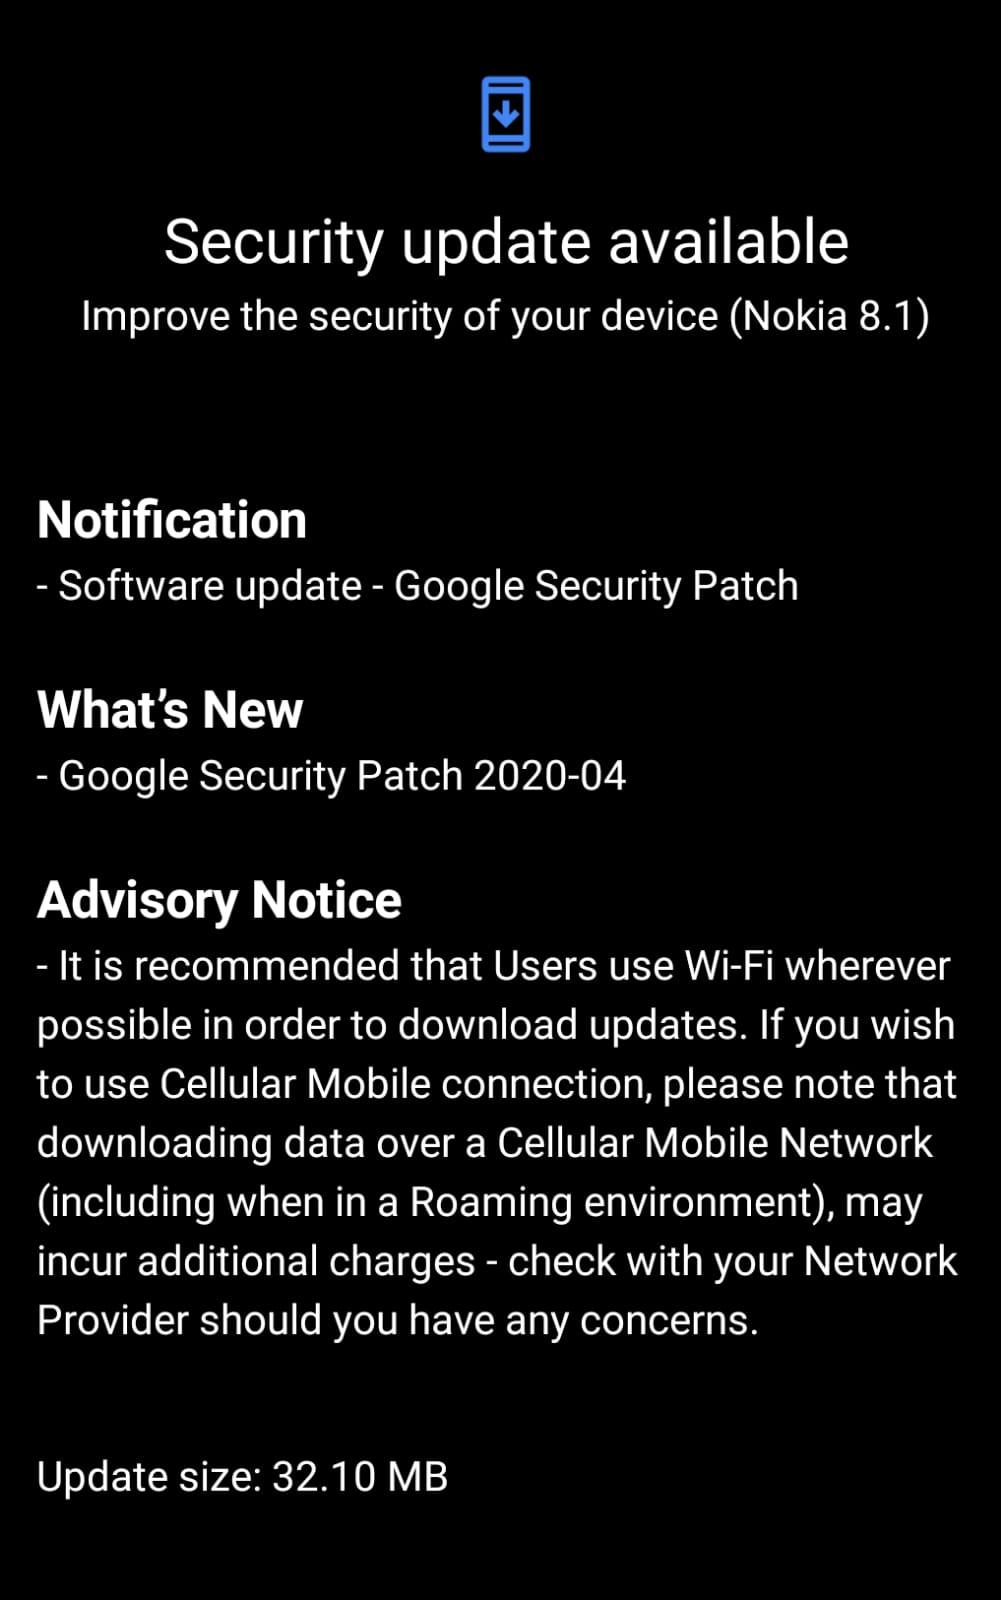 Nokia 8.1 April security patch